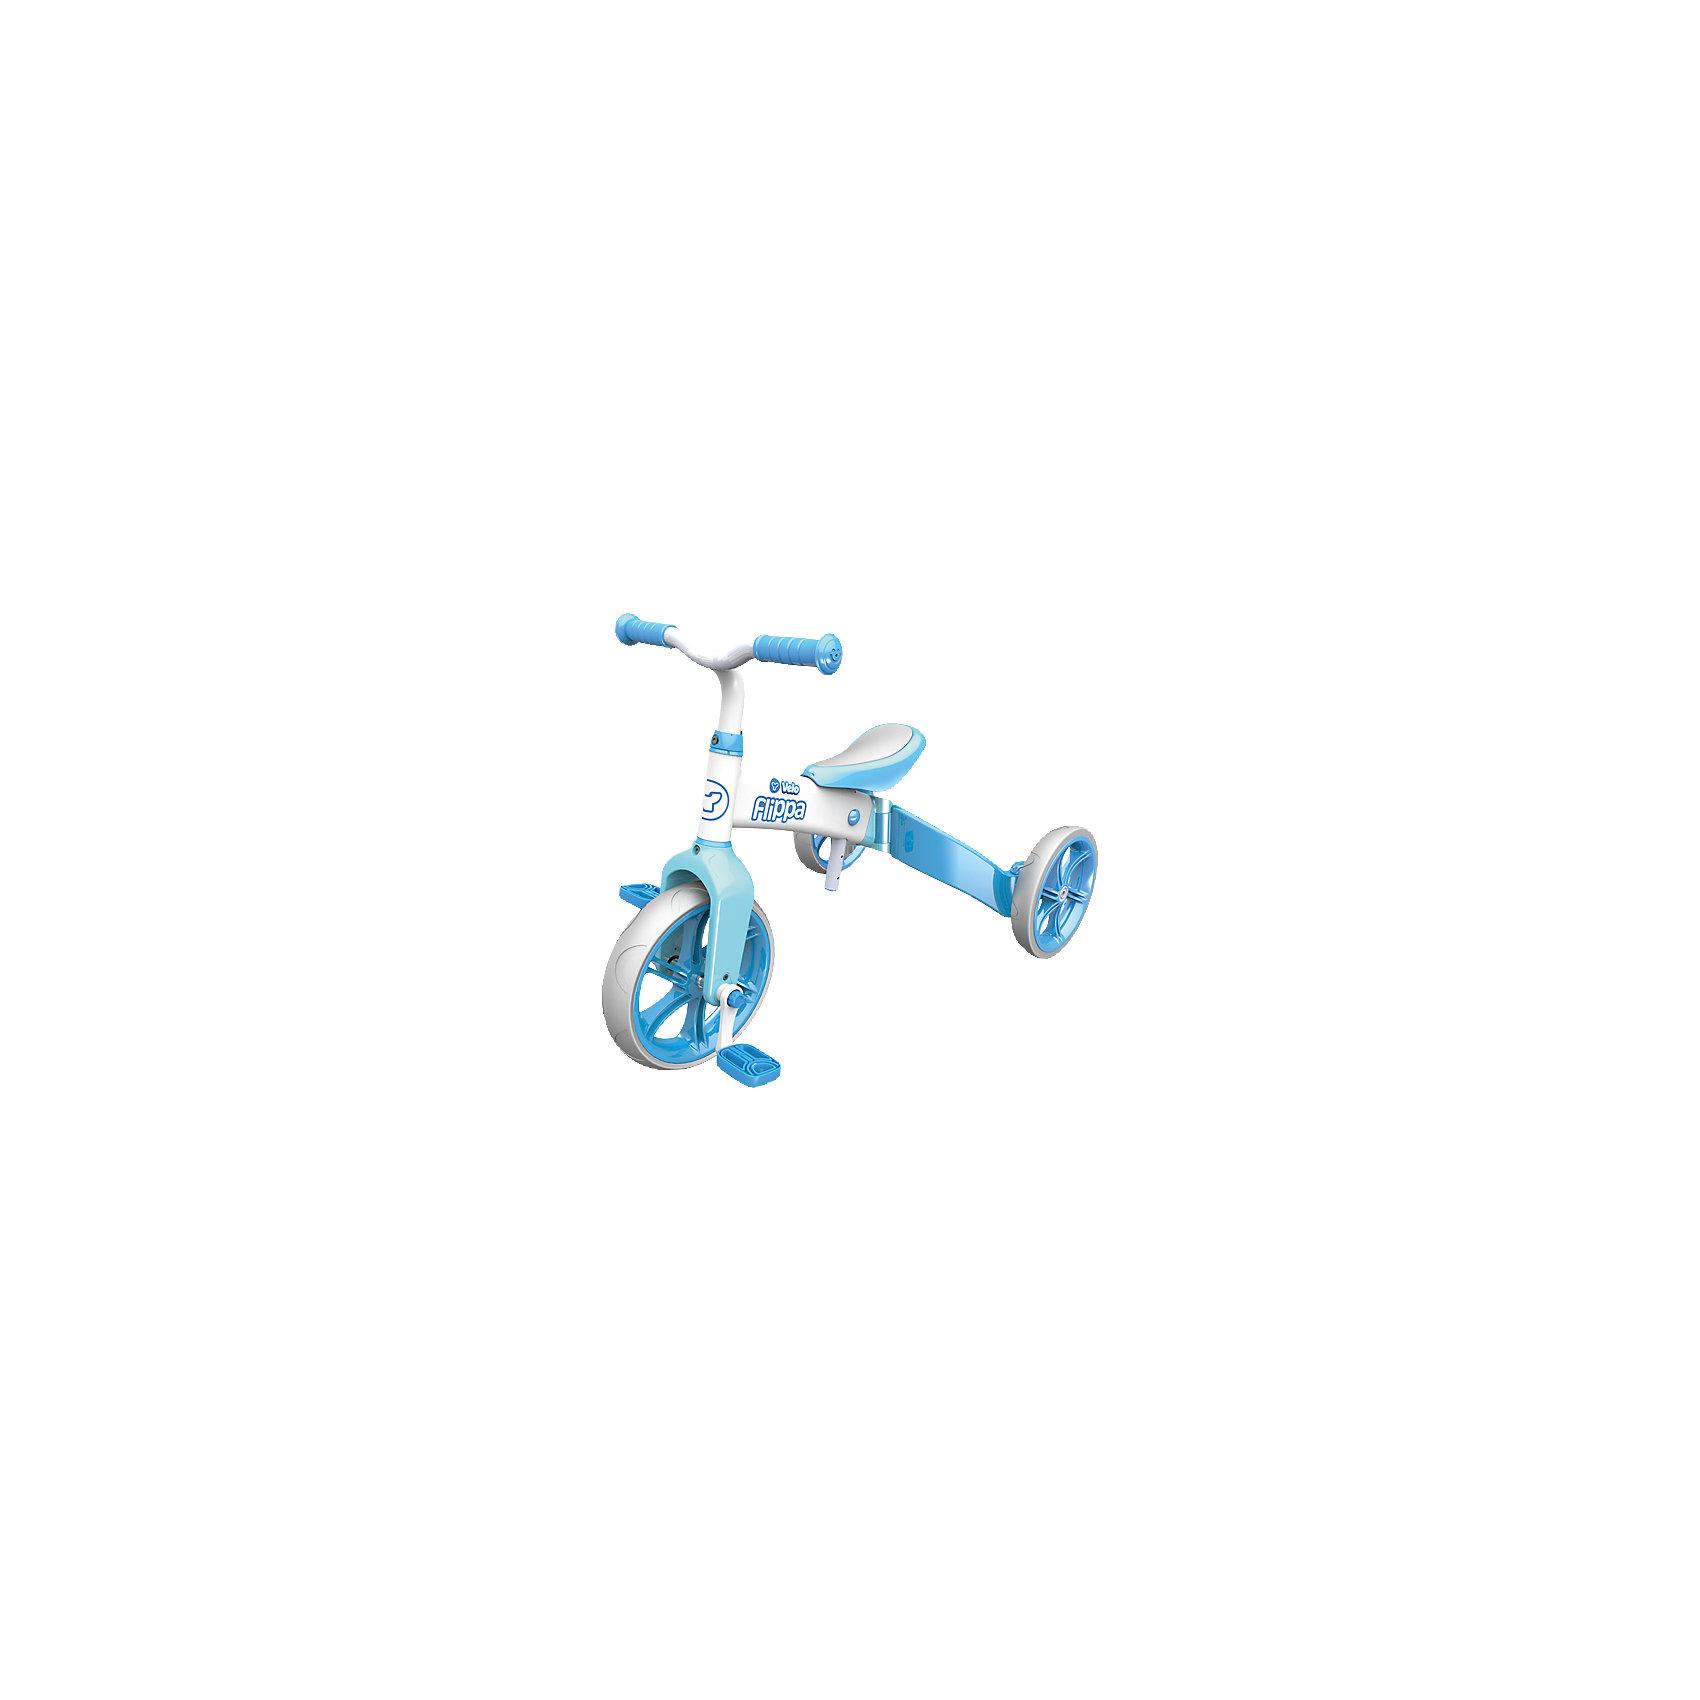 Беговел - трехколесный велосипед  Velo Flippa, голубой, Y-volutionБеговелы<br><br><br>Ширина мм: 645<br>Глубина мм: 462<br>Высота мм: 208<br>Вес г: 6267<br>Цвет: синий<br>Возраст от месяцев: 36<br>Возраст до месяцев: 60<br>Пол: Мужской<br>Возраст: Детский<br>SKU: 4592673